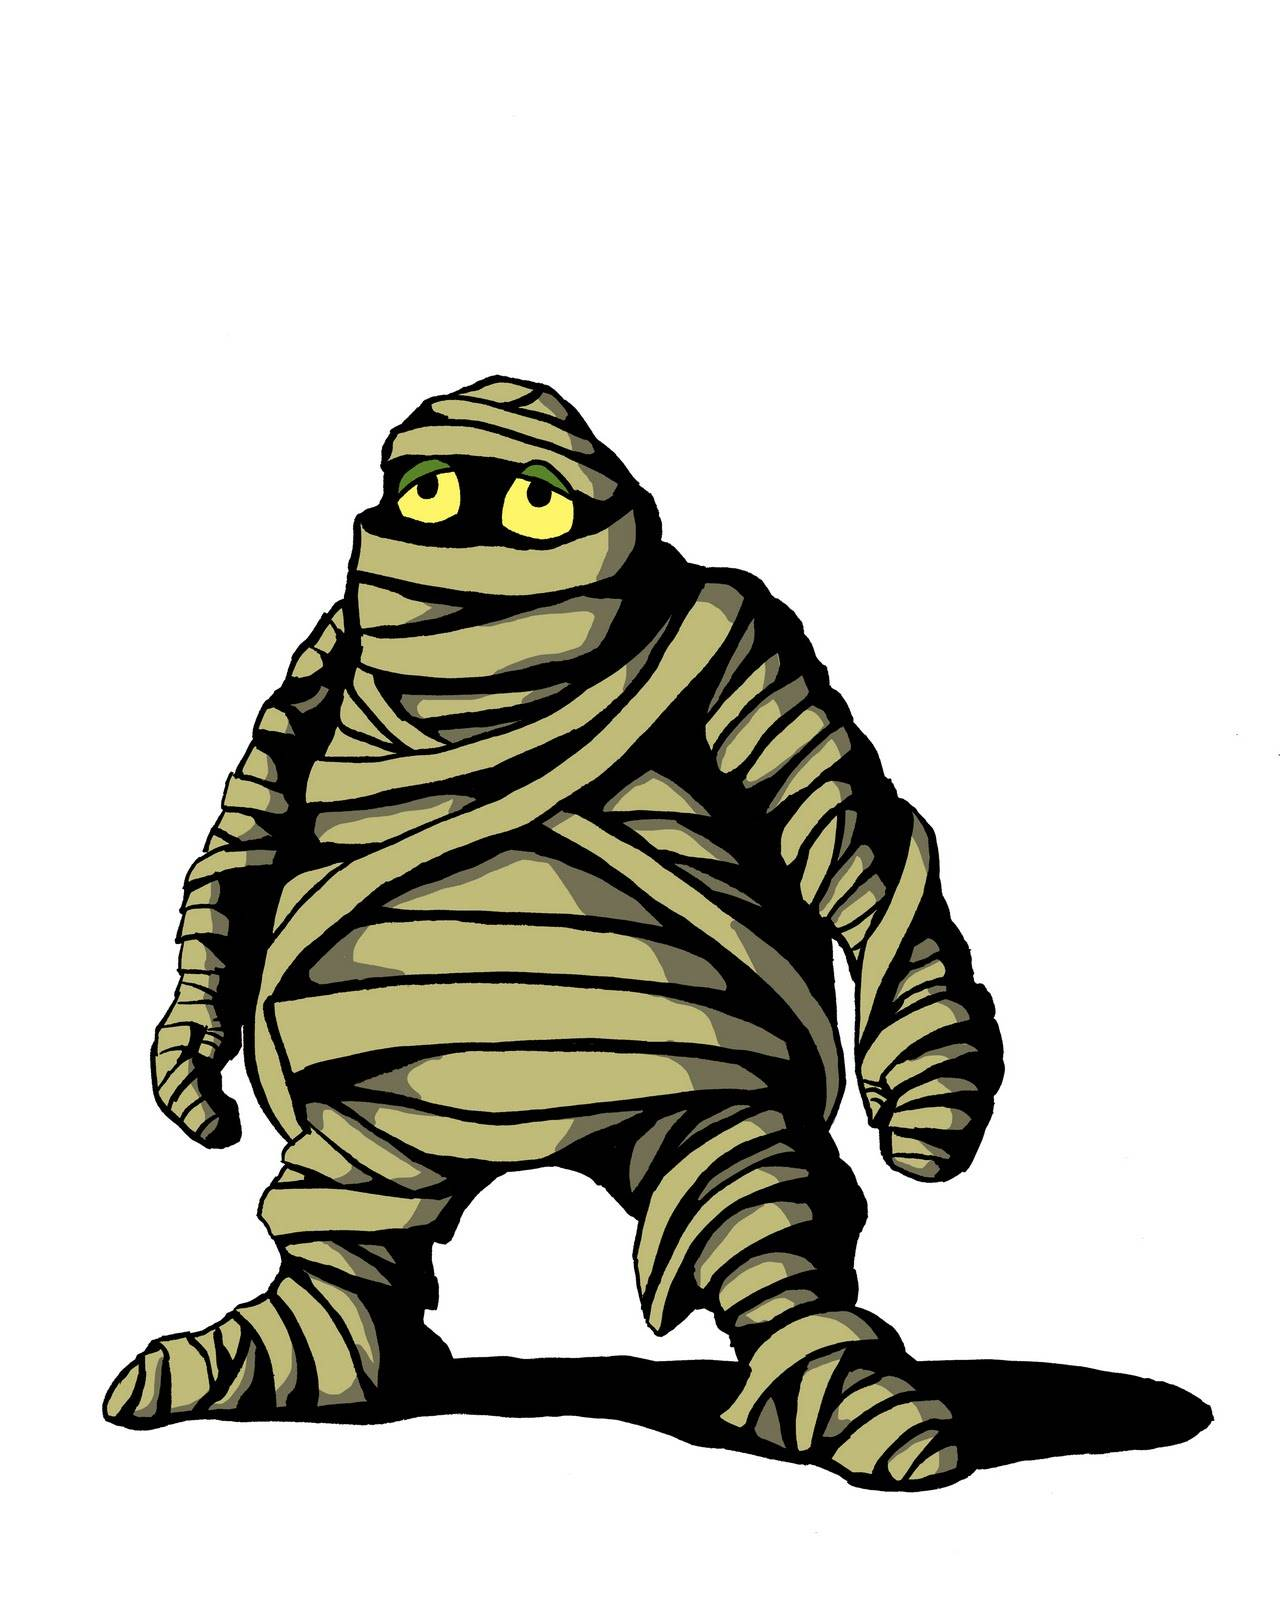 Mummy cartoon clipart 2